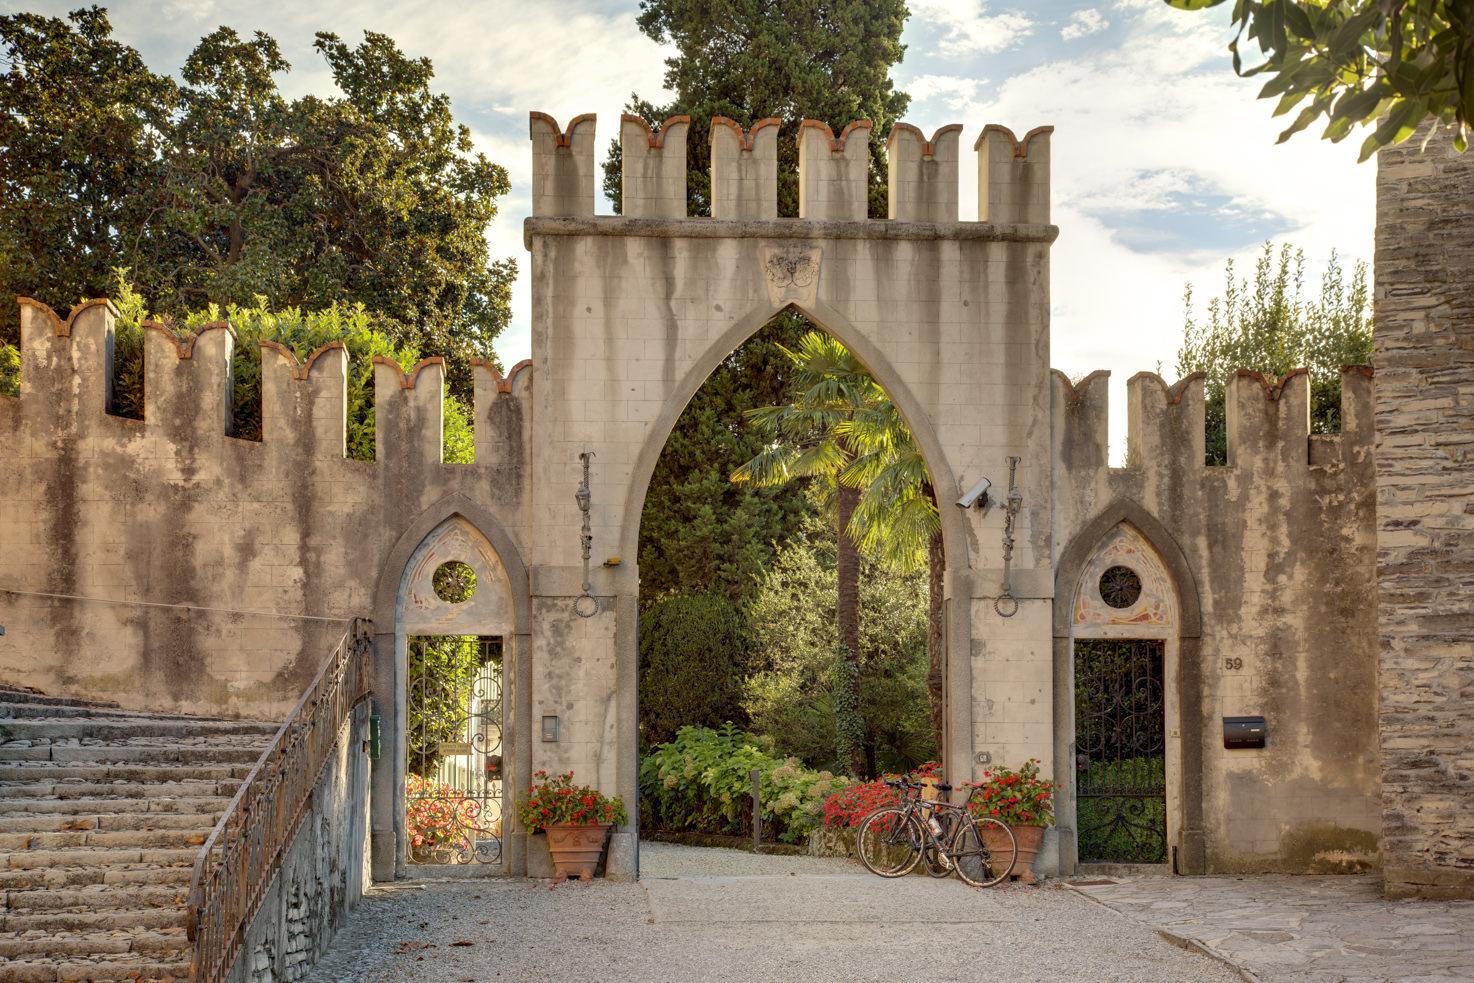 Upper gate entrance